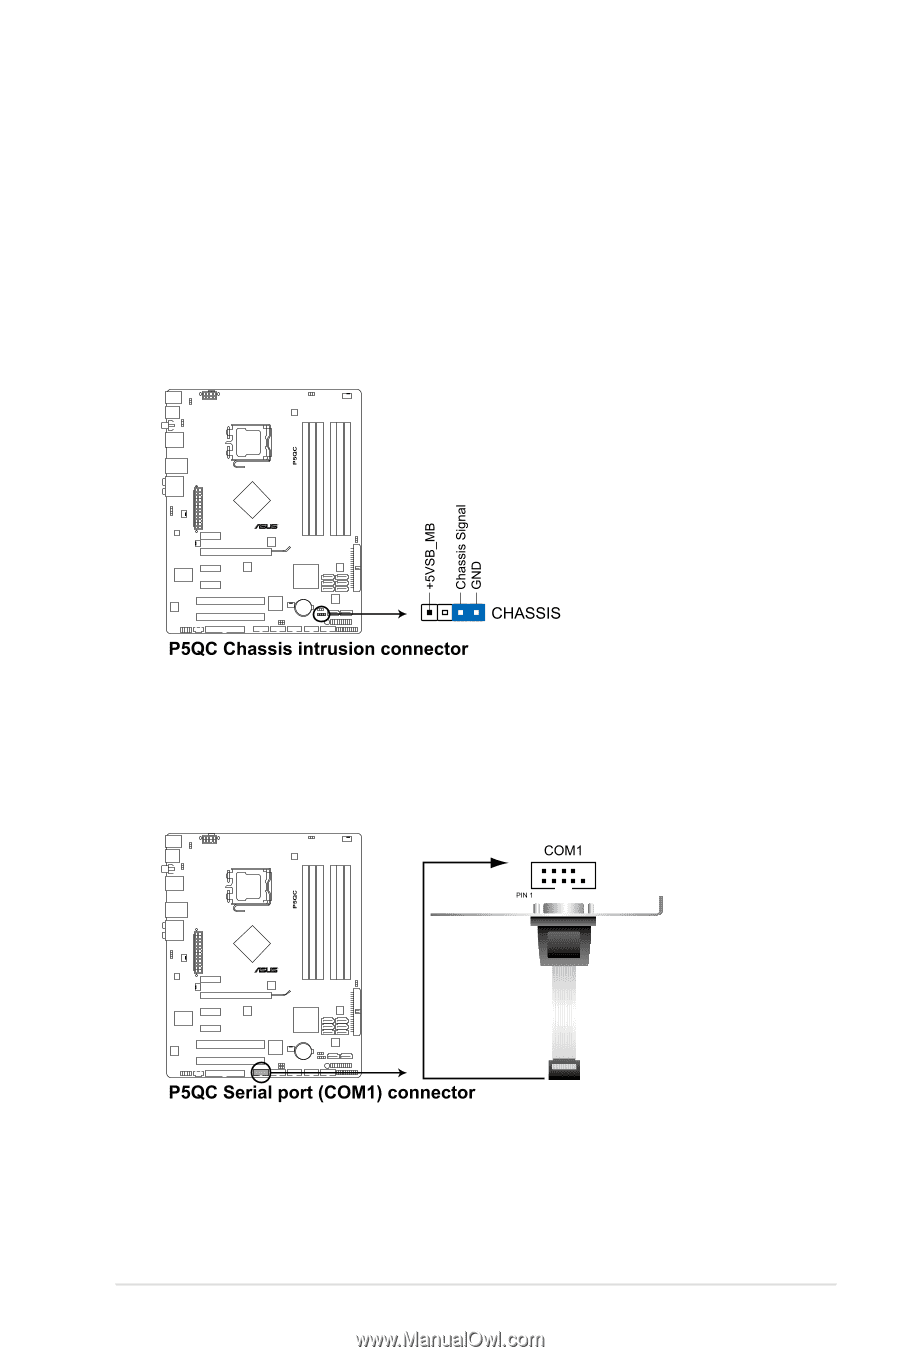 ASUS P5QC PC PROBEII WINDOWS 8 DRIVER DOWNLOAD